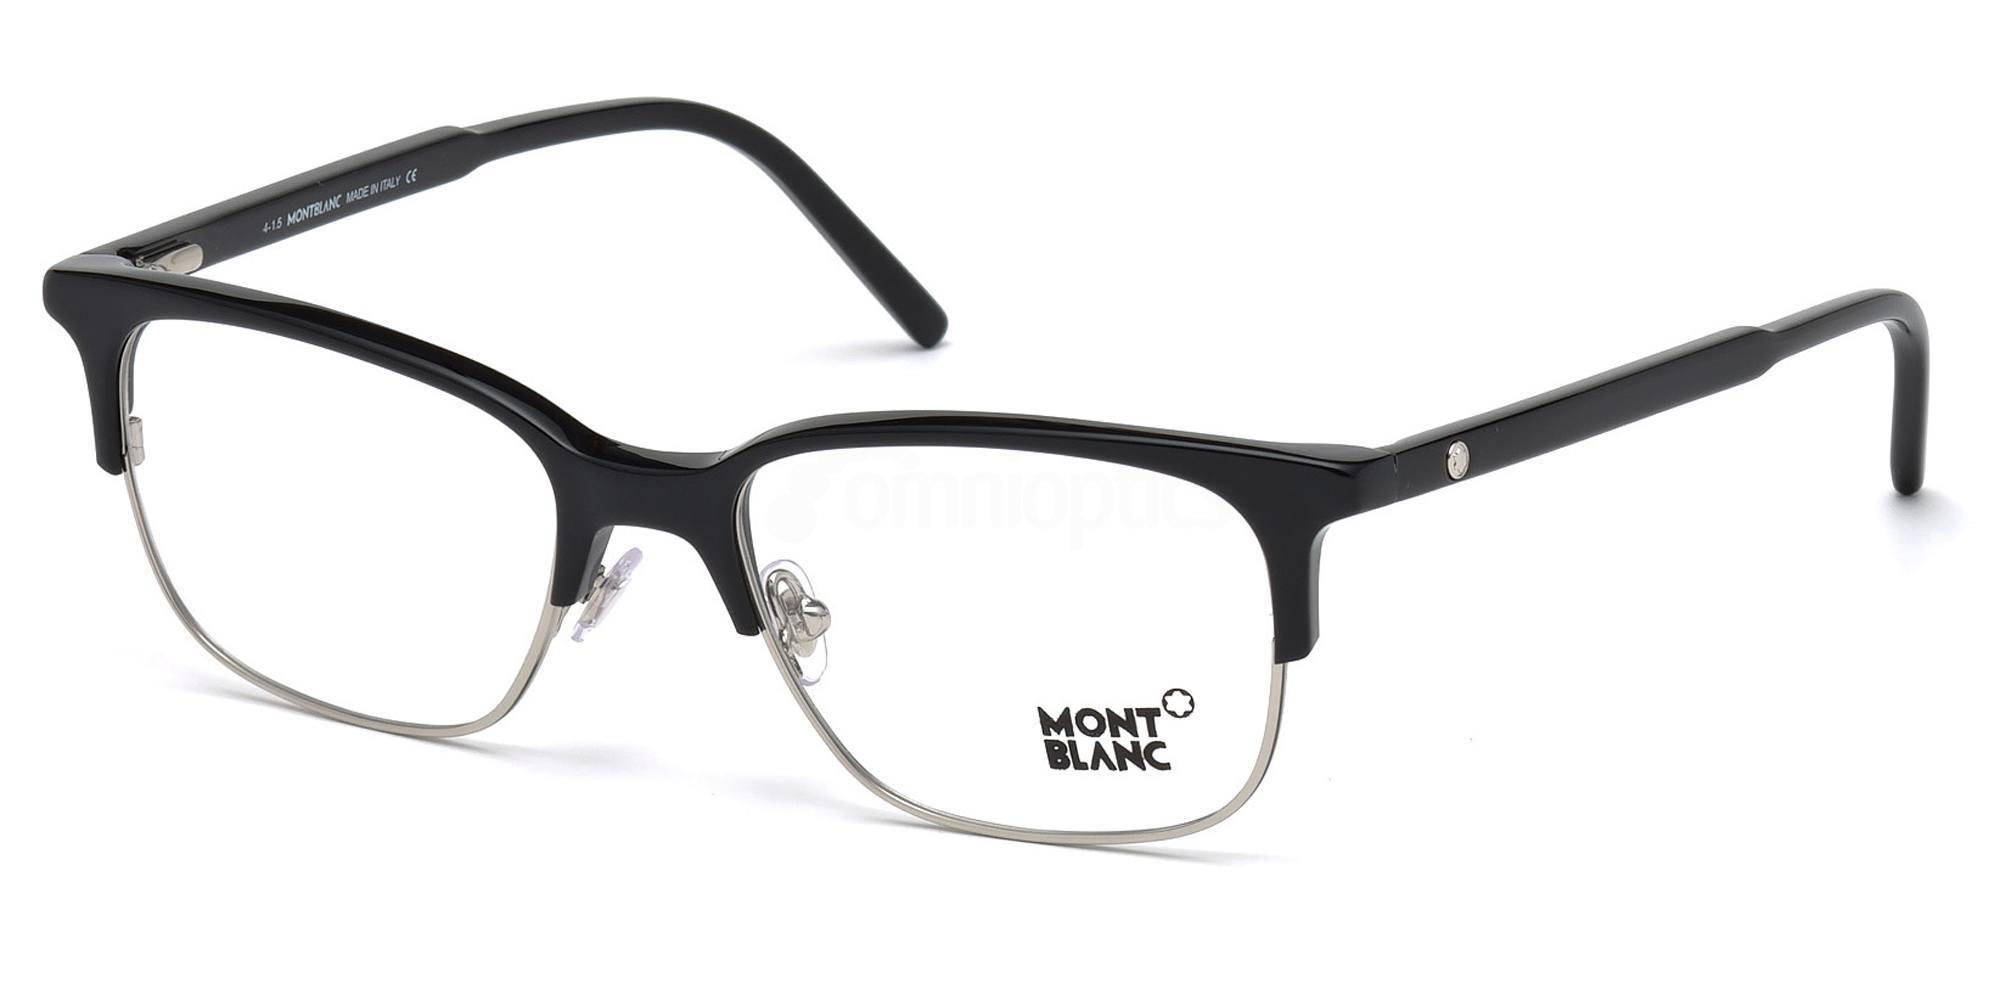 001 MB0552 Glasses, Mont Blanc